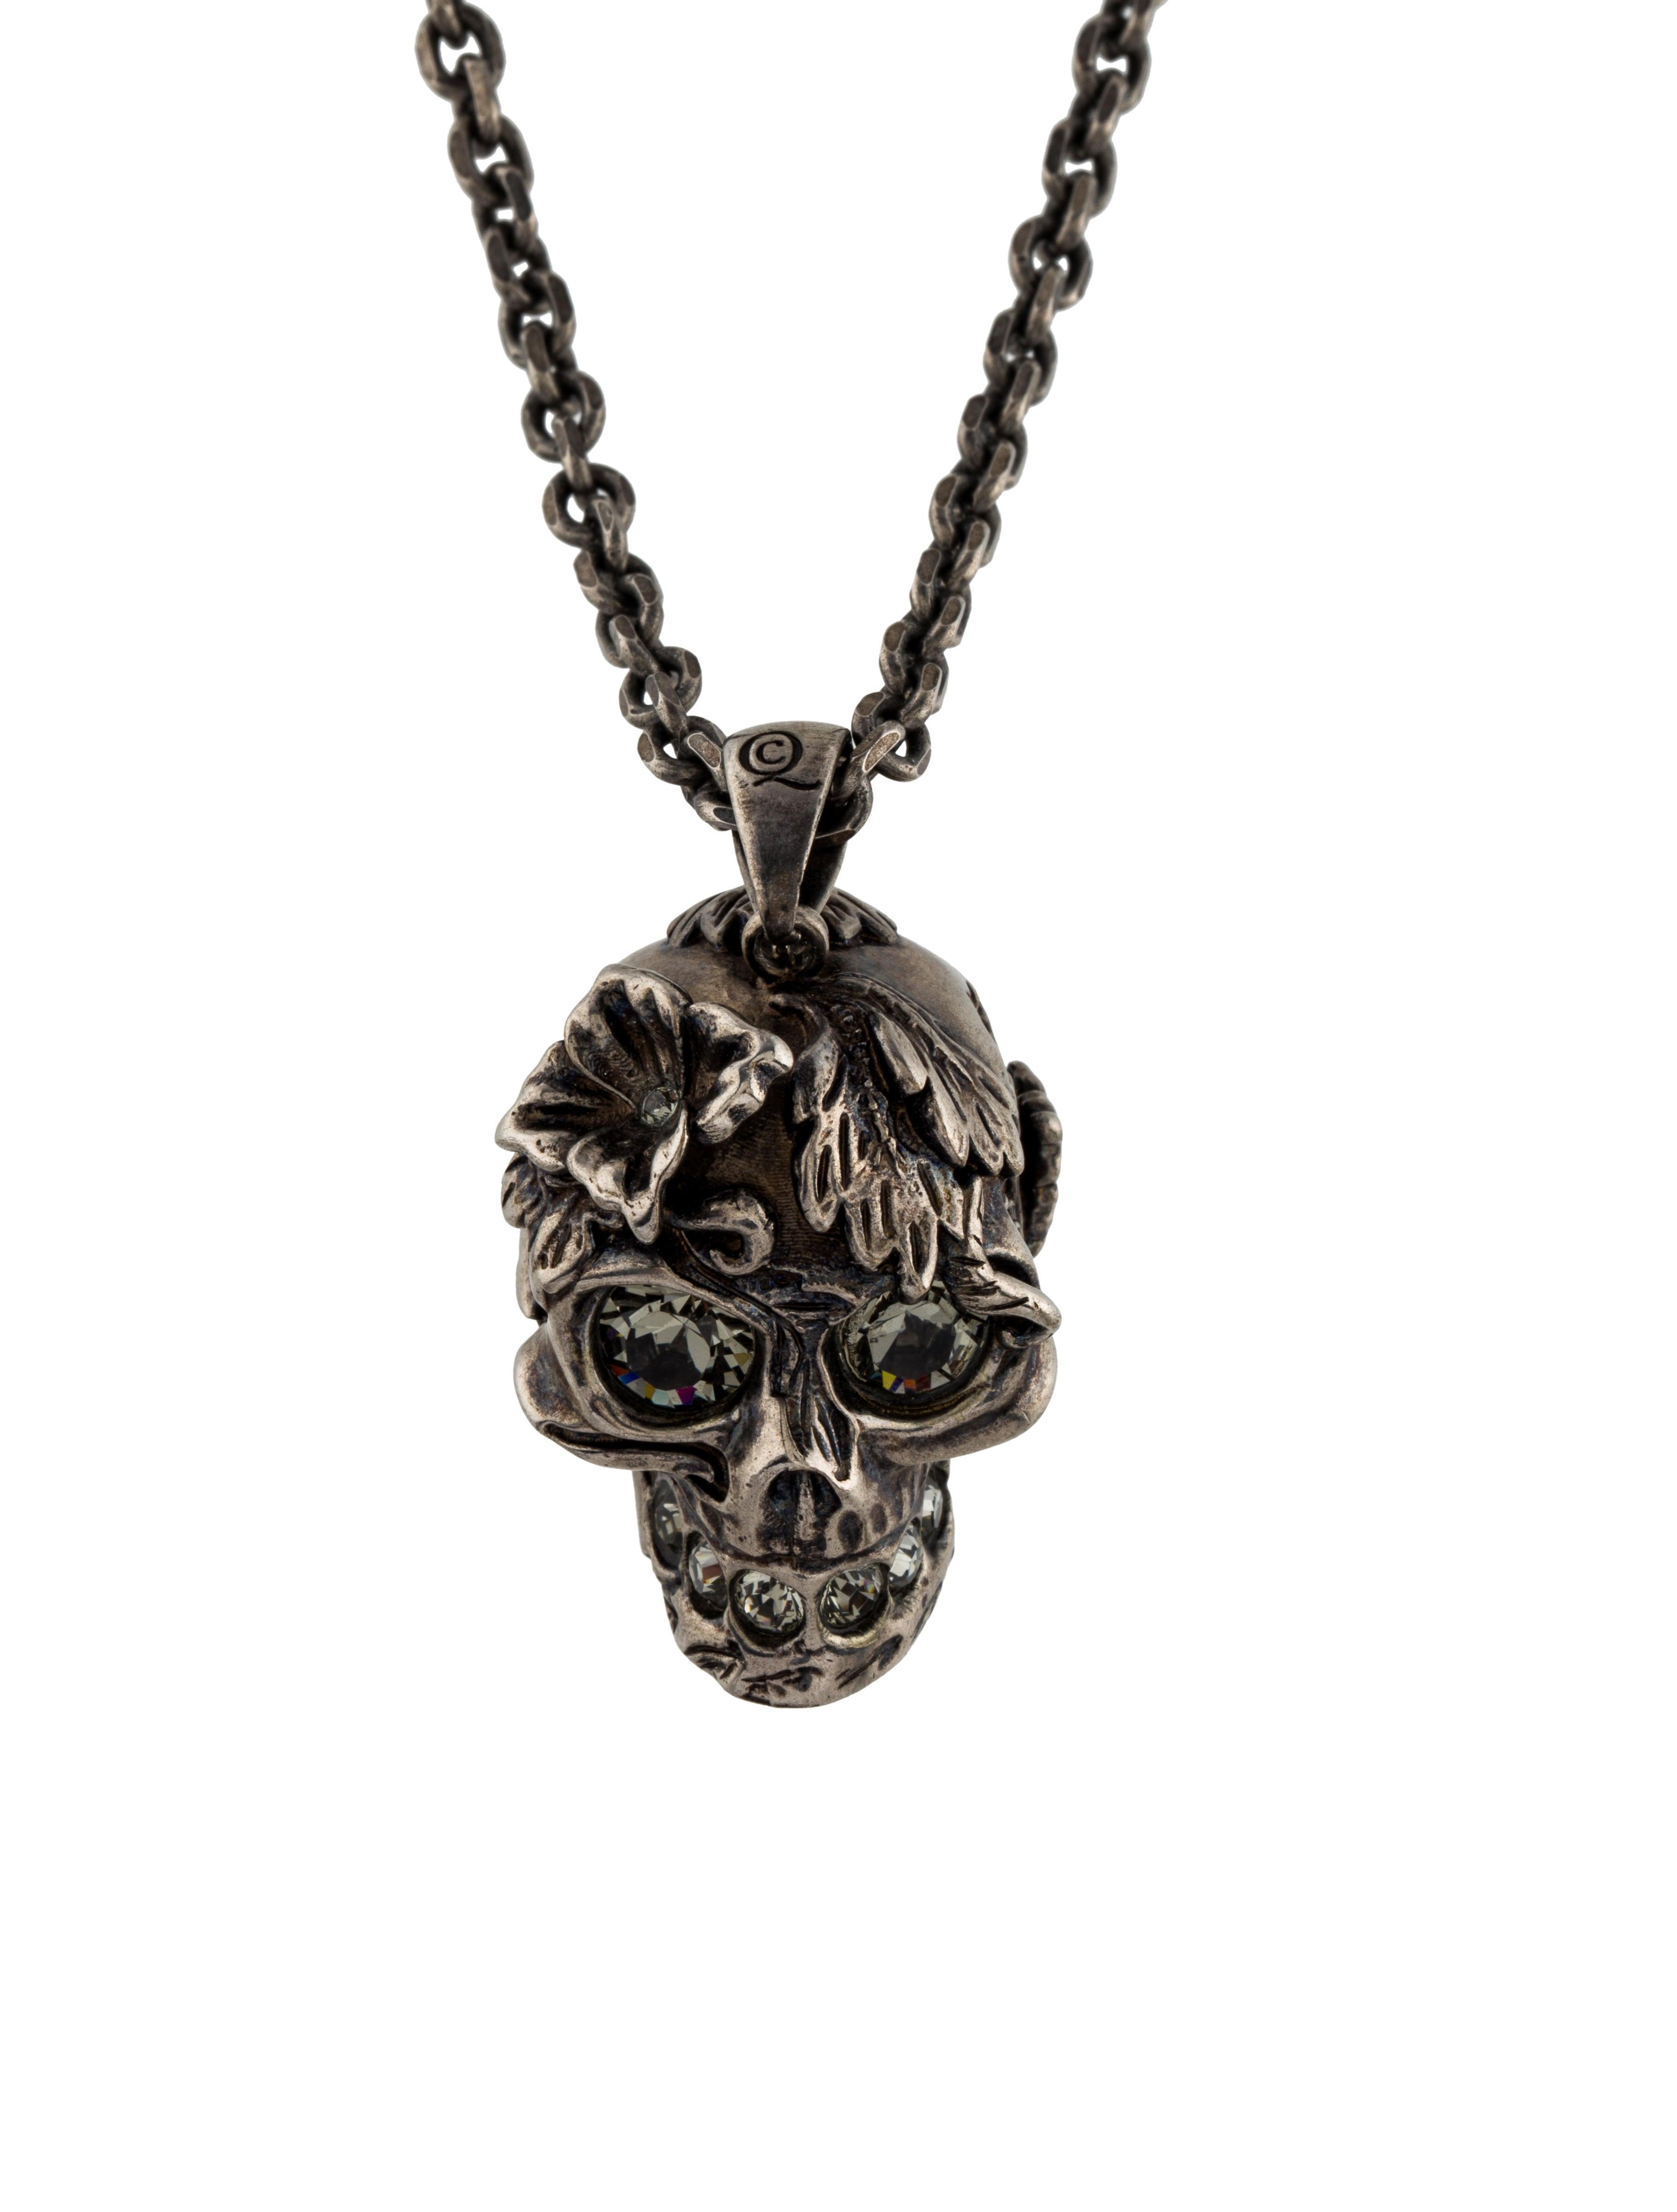 8eff809dd3ae8e Alexander Mcqueen Crystal Skull Pendant Necklace Necklaces